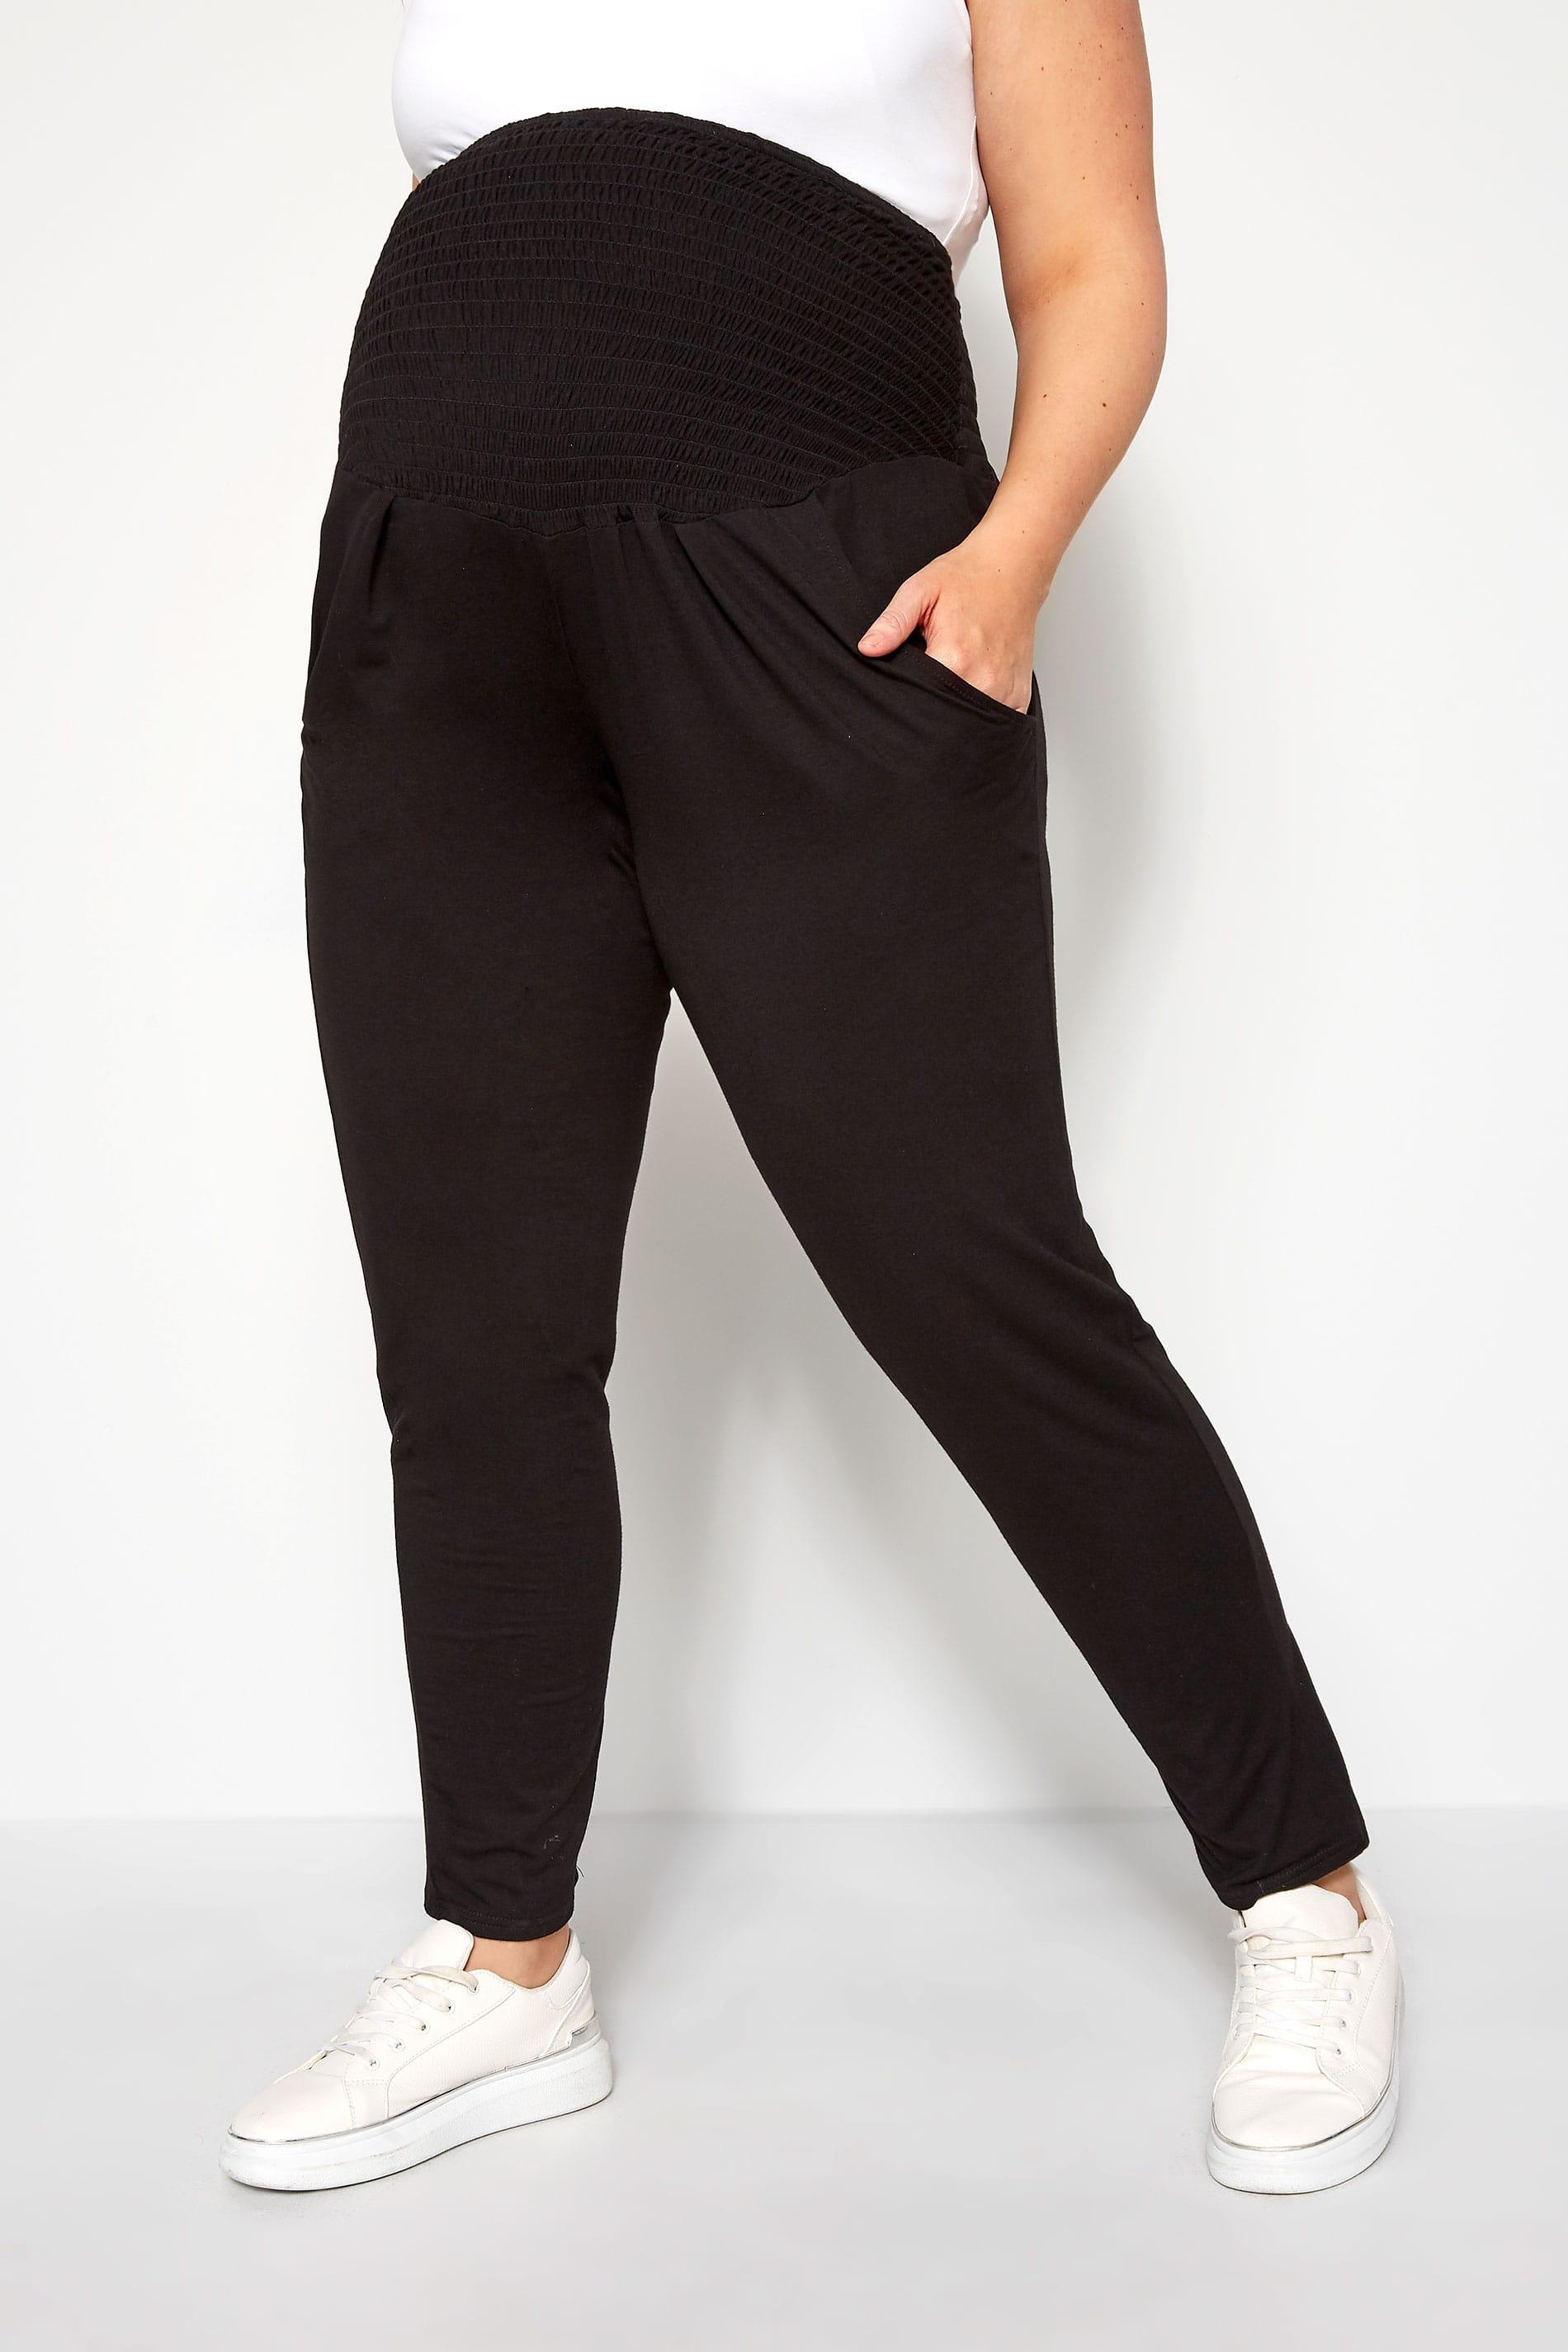 BUMP IT UP MATERNITY Black Shirred Harem Trousers